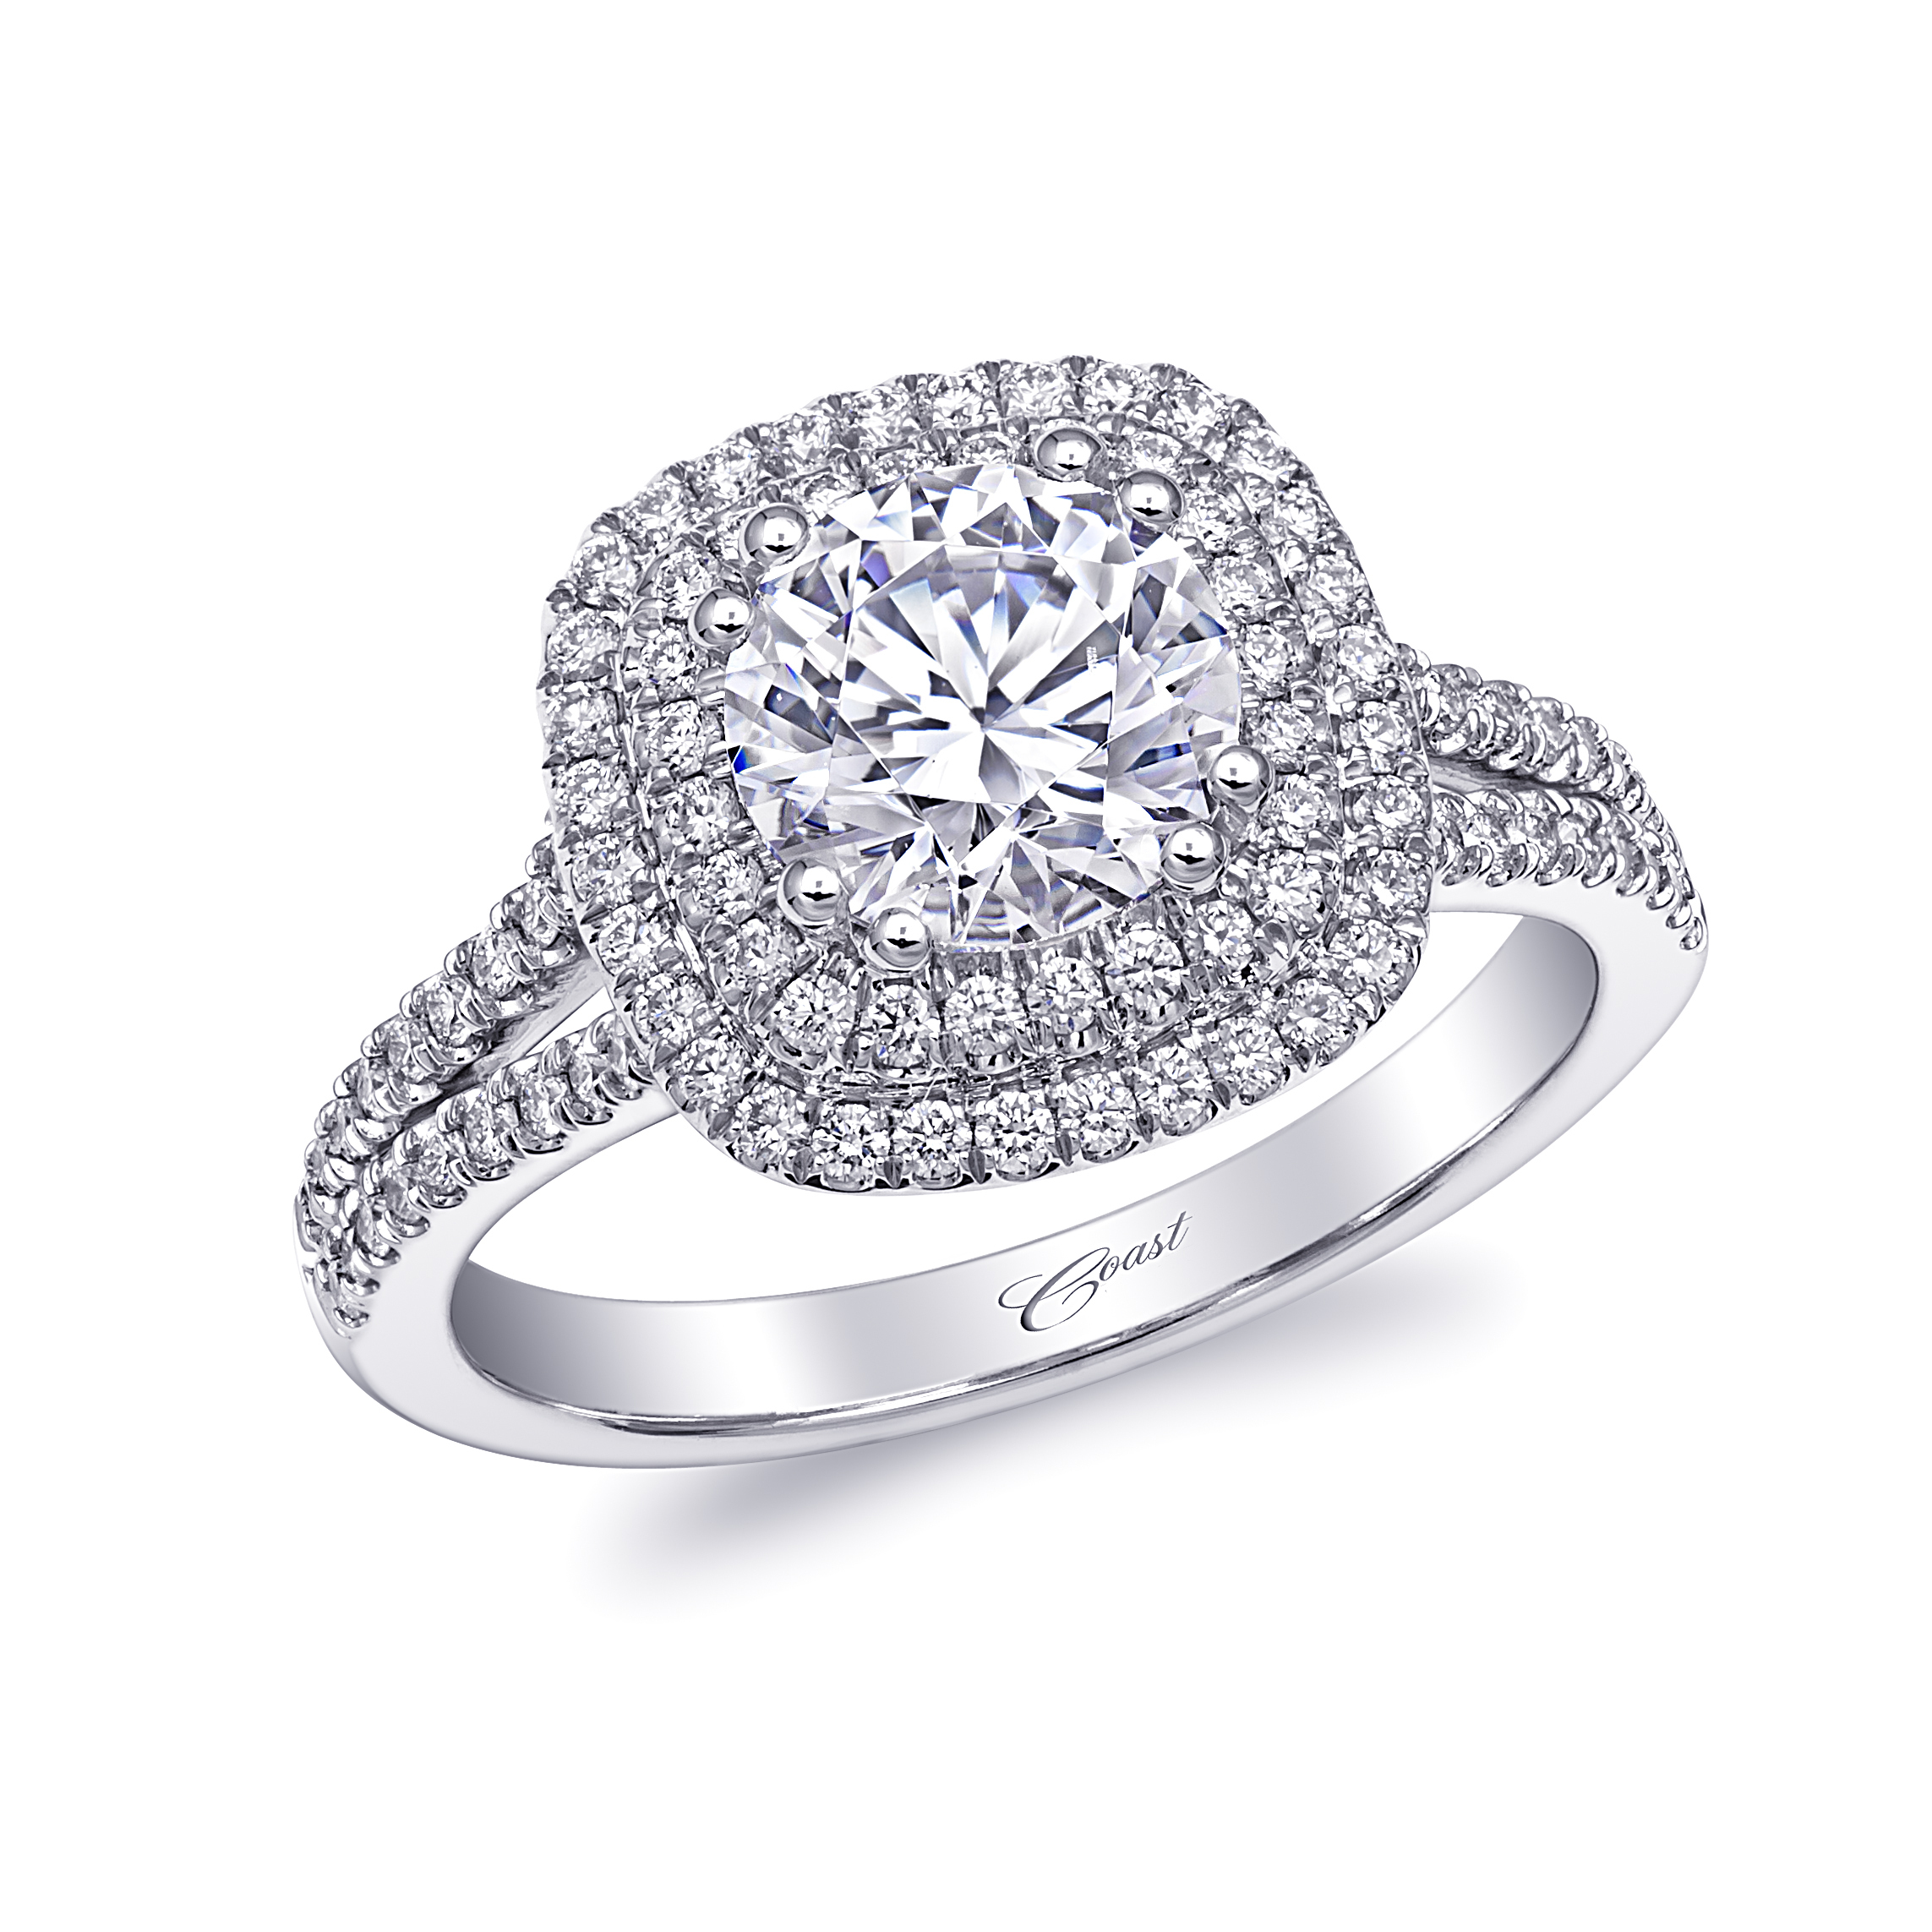 Charisma Engagement Ring - Double Halo Split Shank